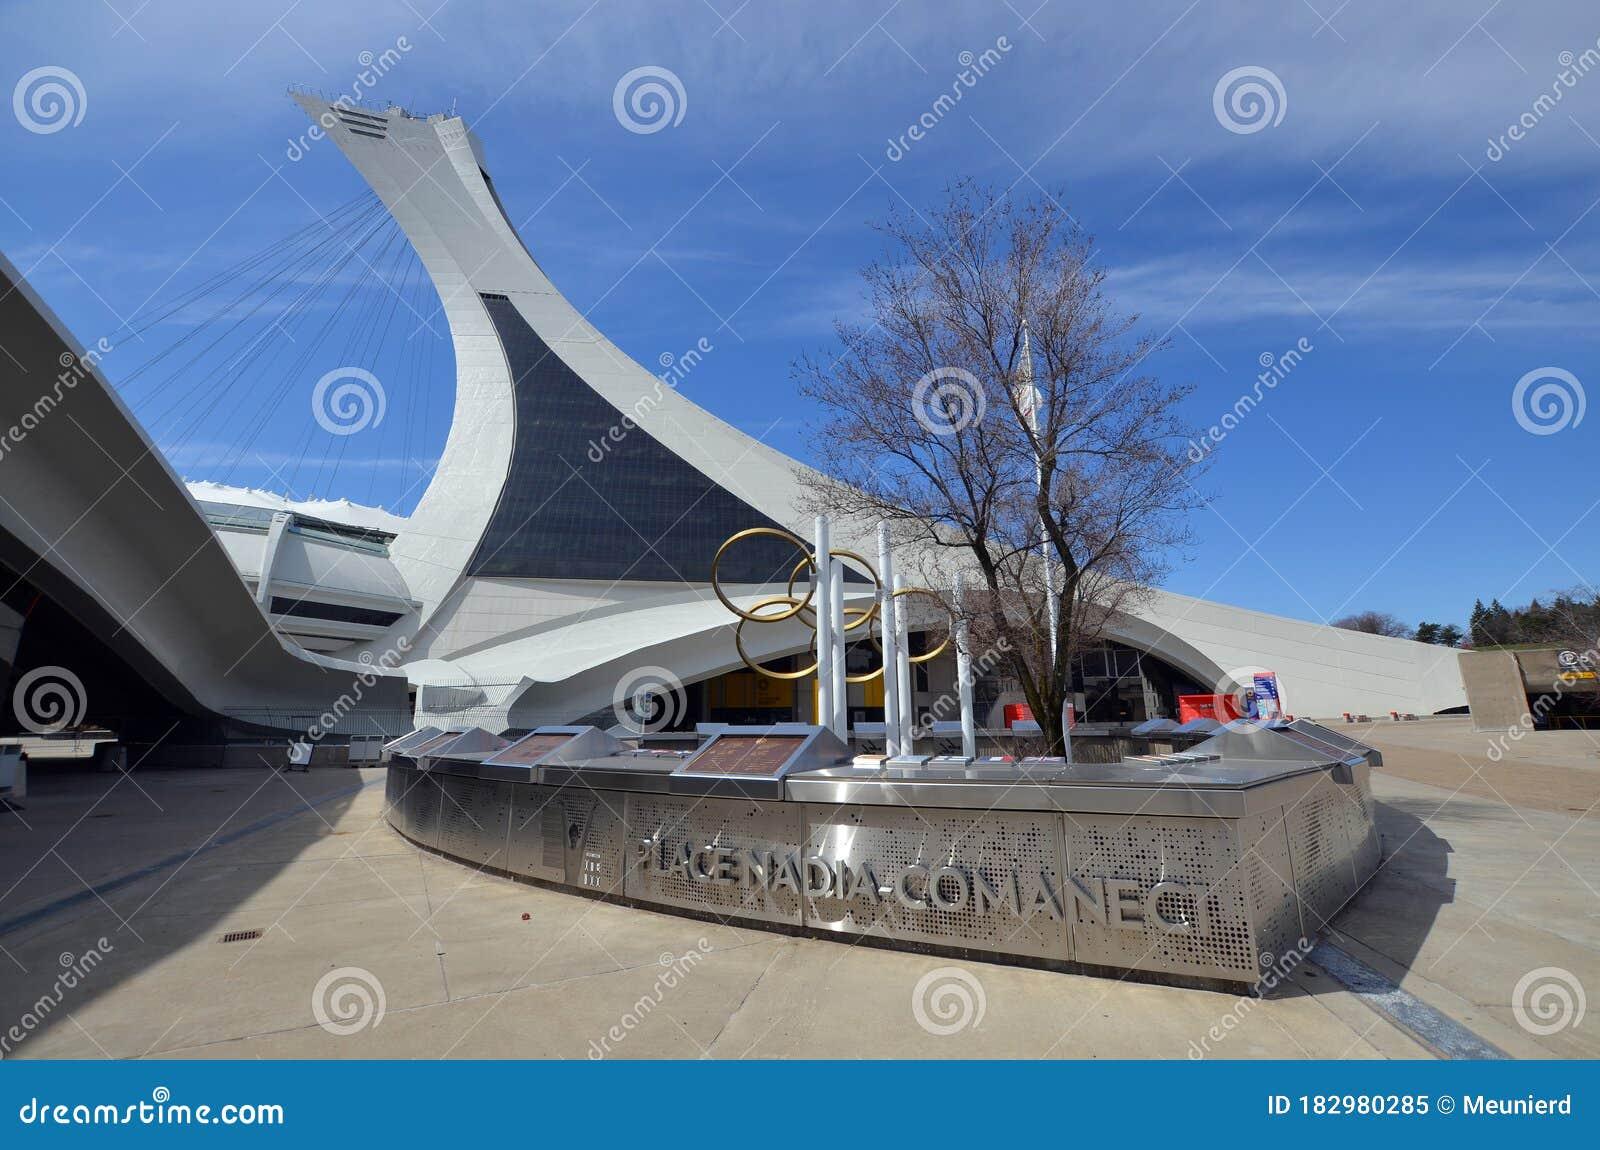 Nadia Comaneci Place Near The Olympic Stadium Editorial